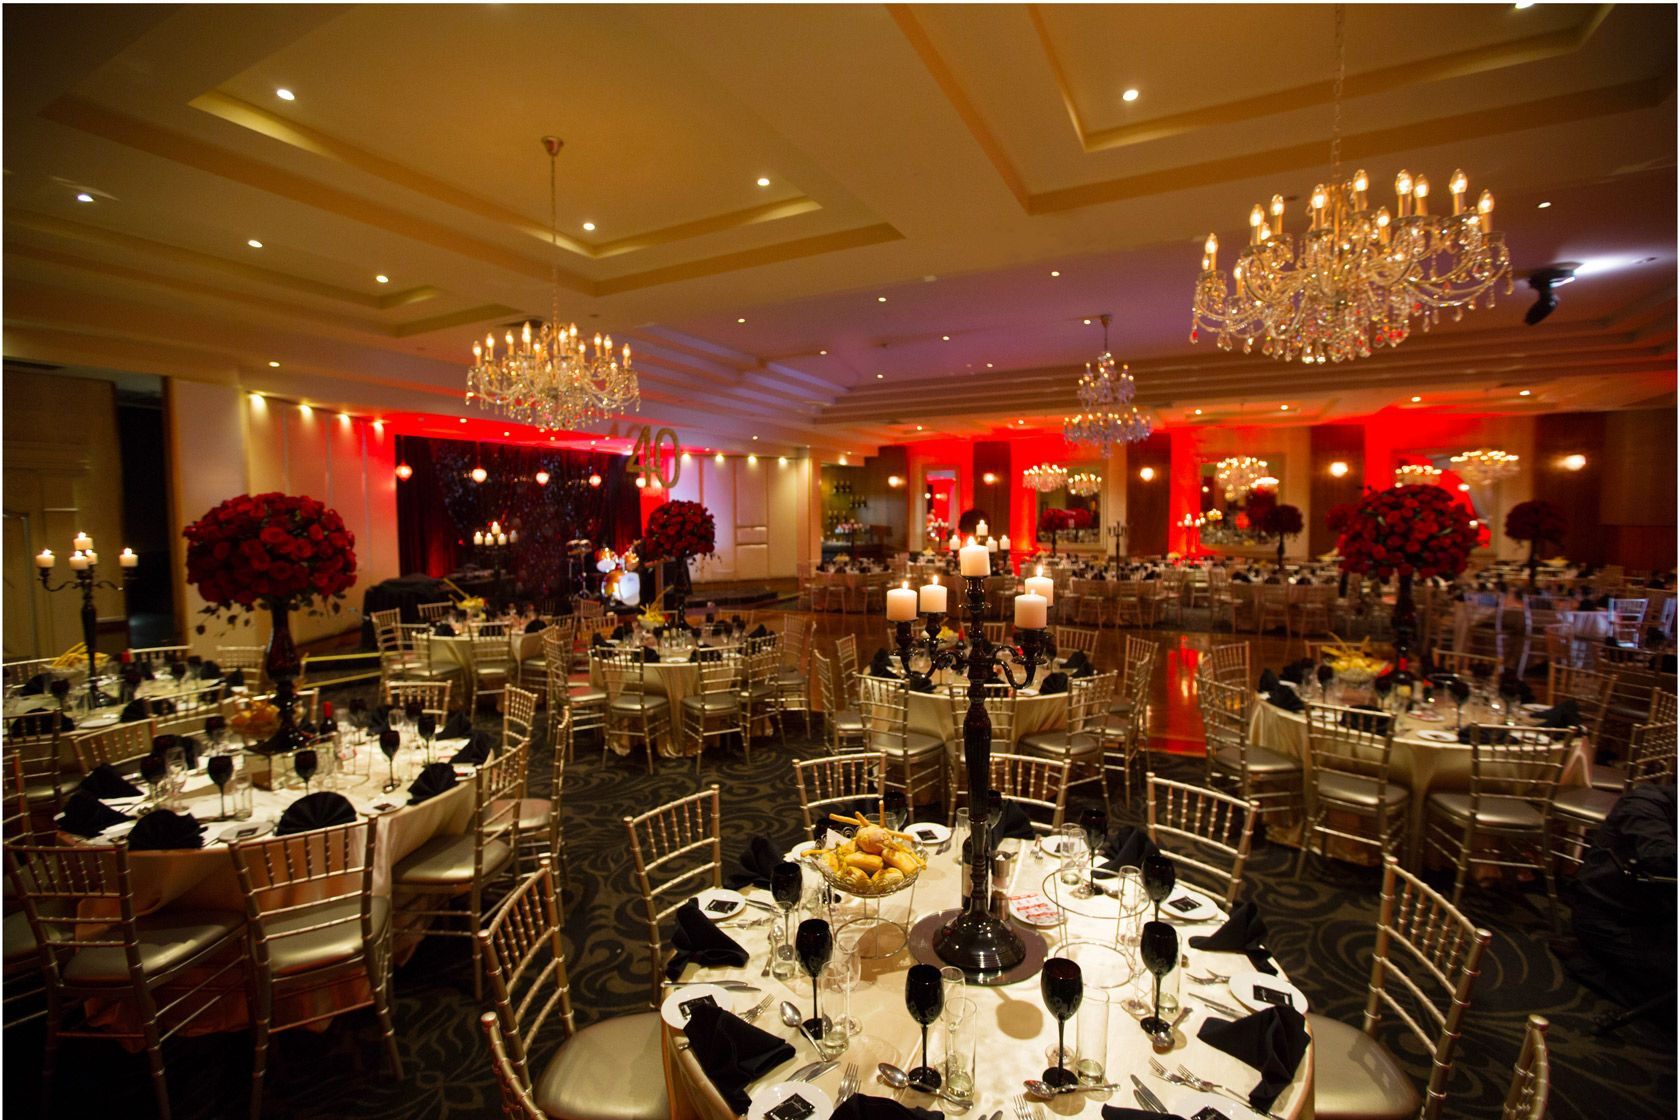 Conca Doro Classic Ballroom 9 Stunning New Chandeliers Further